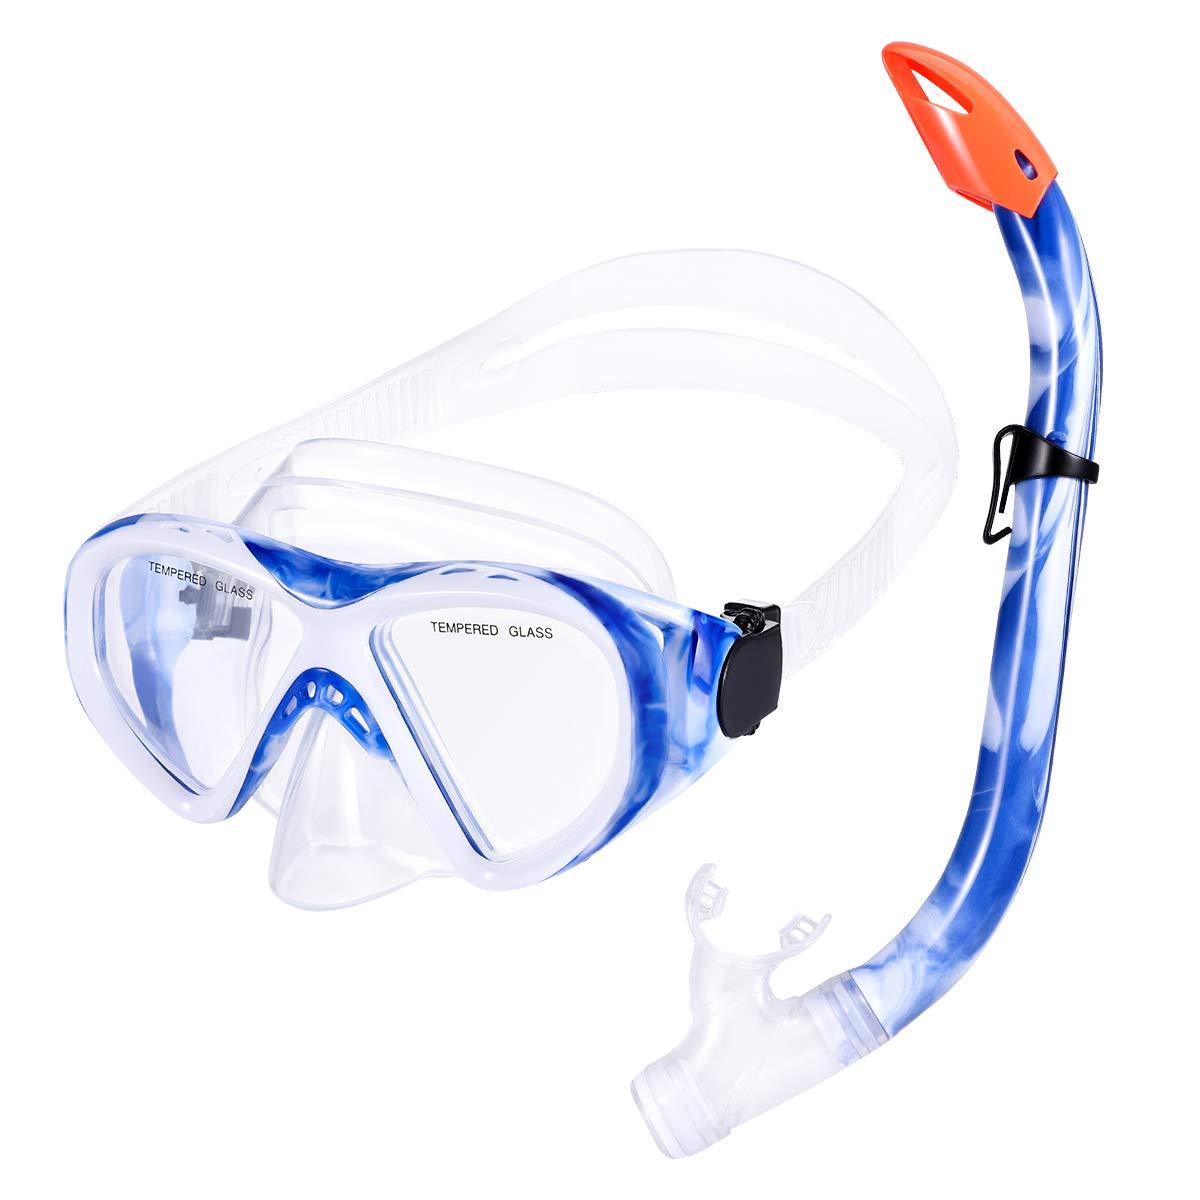 UK Kids Diving Snorkel Set Anti Fog Goggles Swimming Dry Tube Snorkeling Scuba